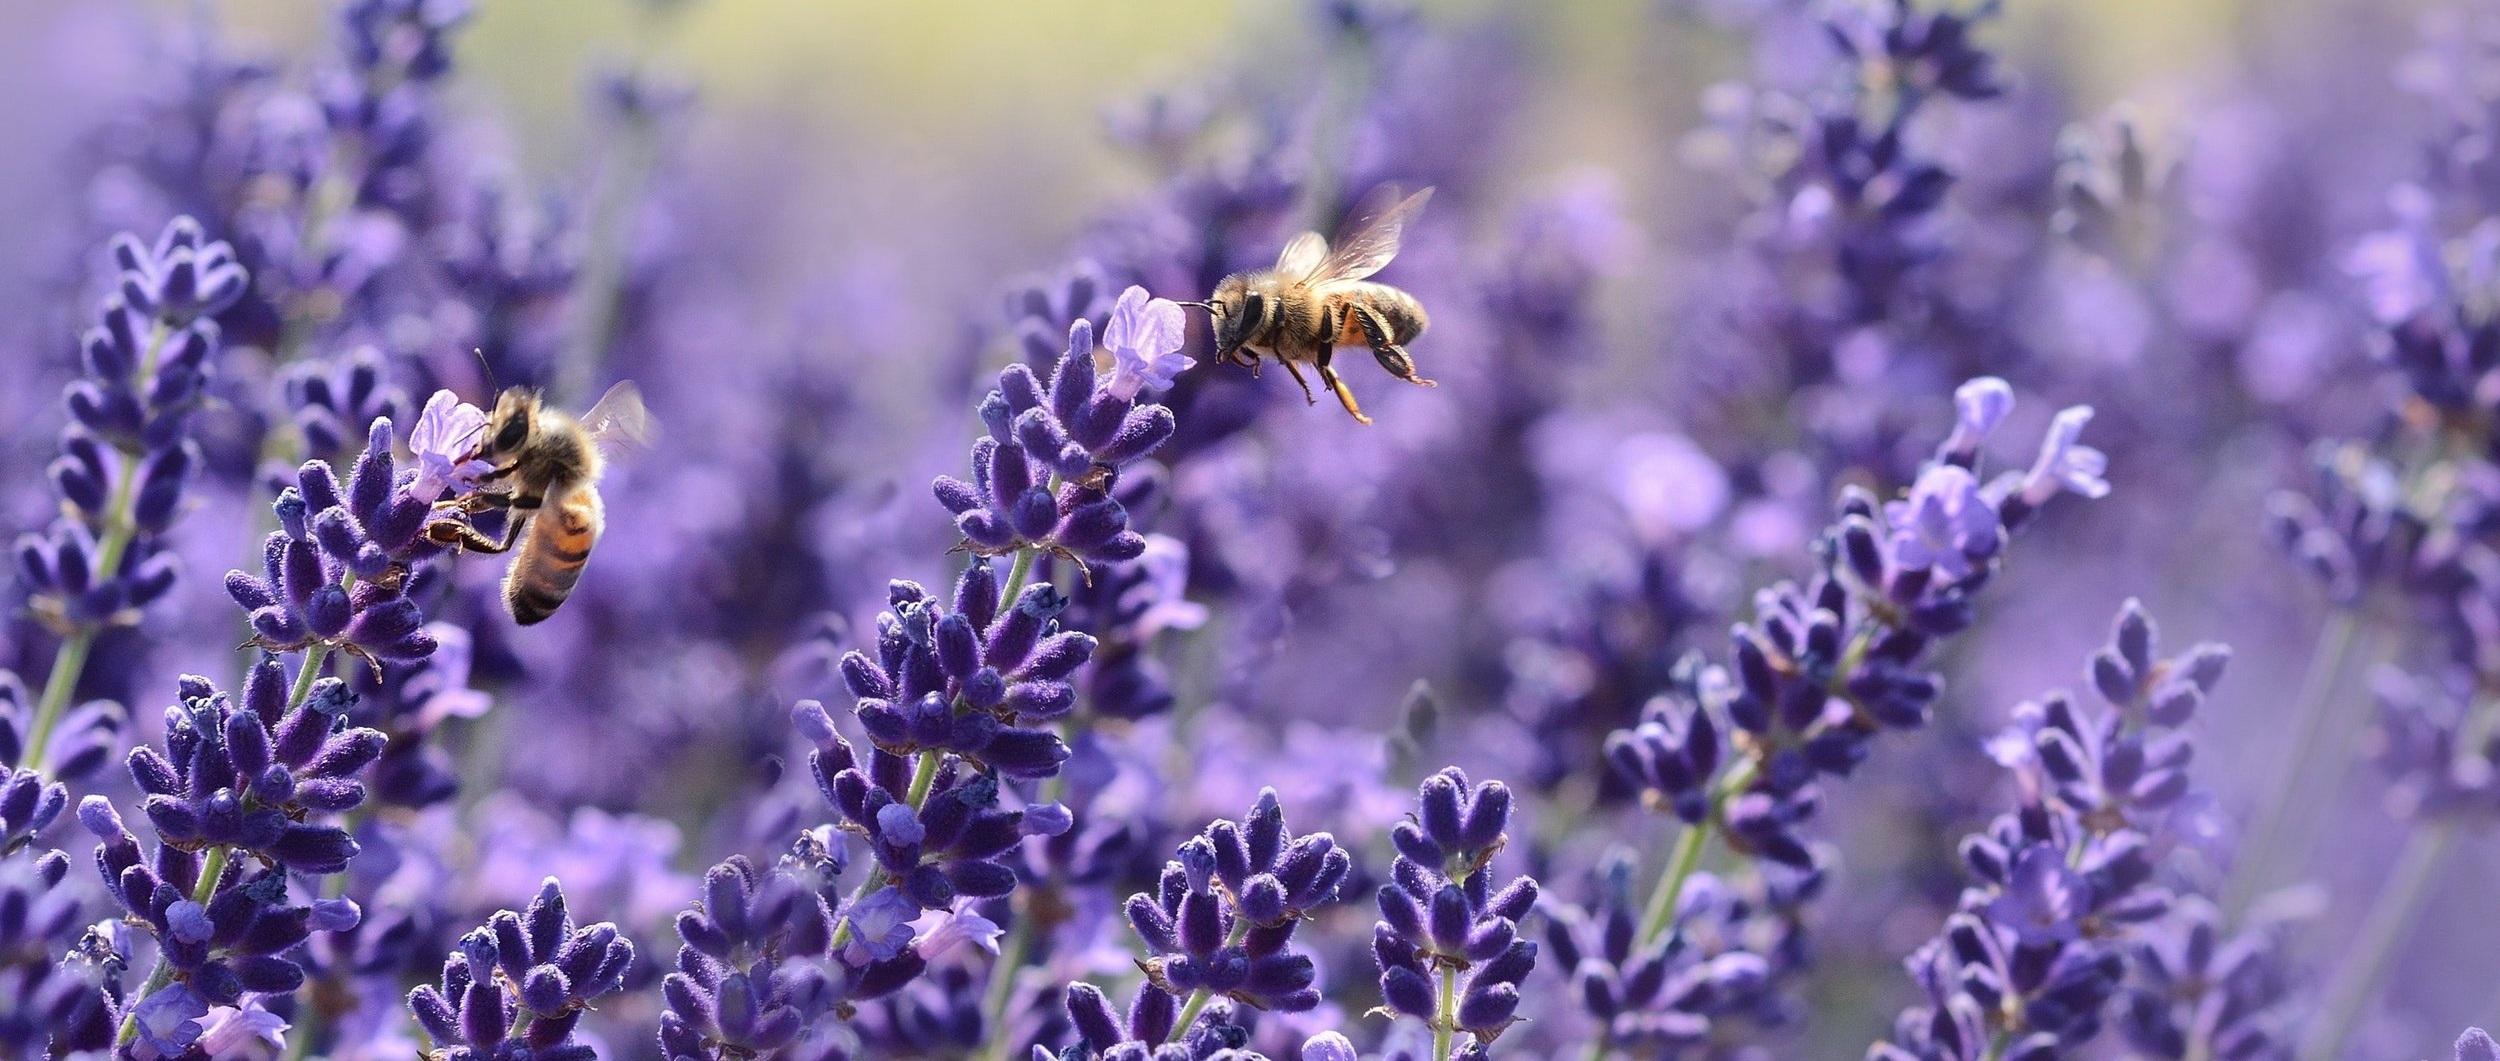 Benefits of Lavender -